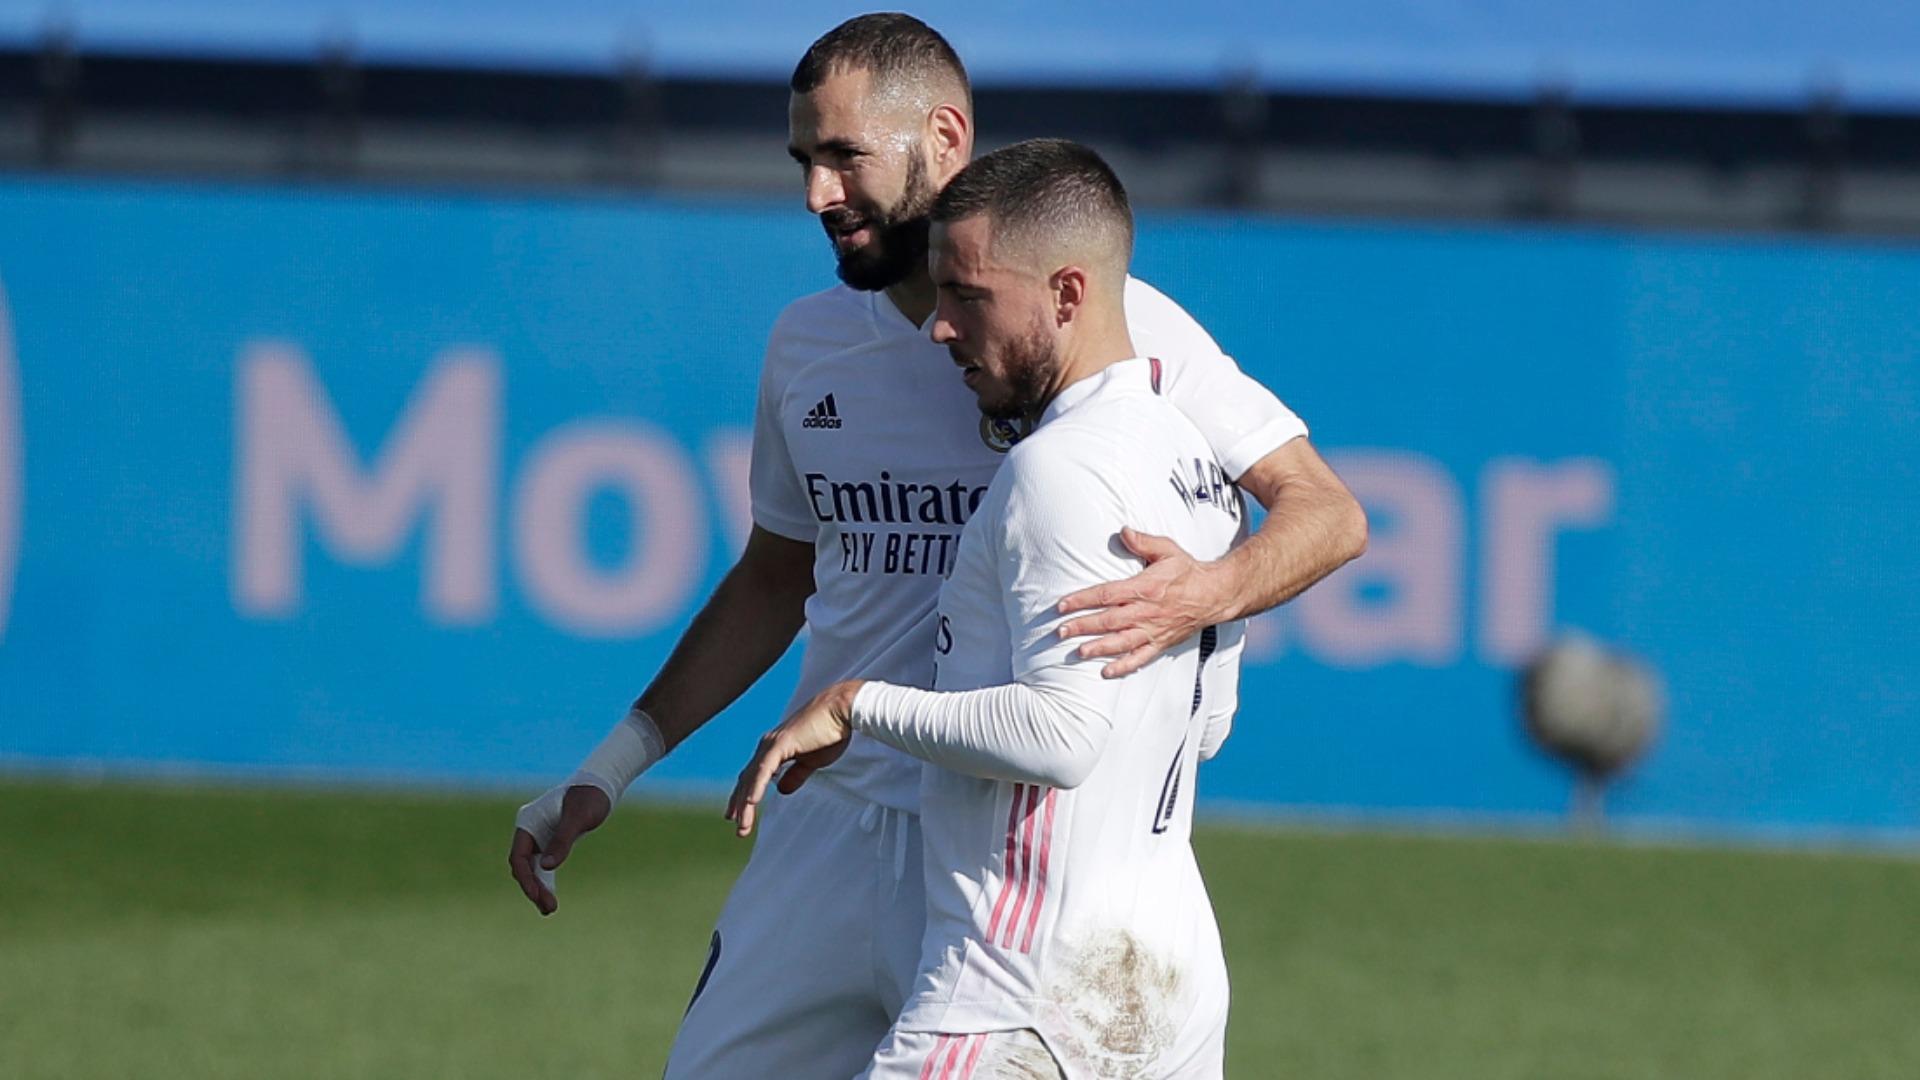 Zidane insists Hazard has 'no problems' despite not celebrating Real Madrid goal